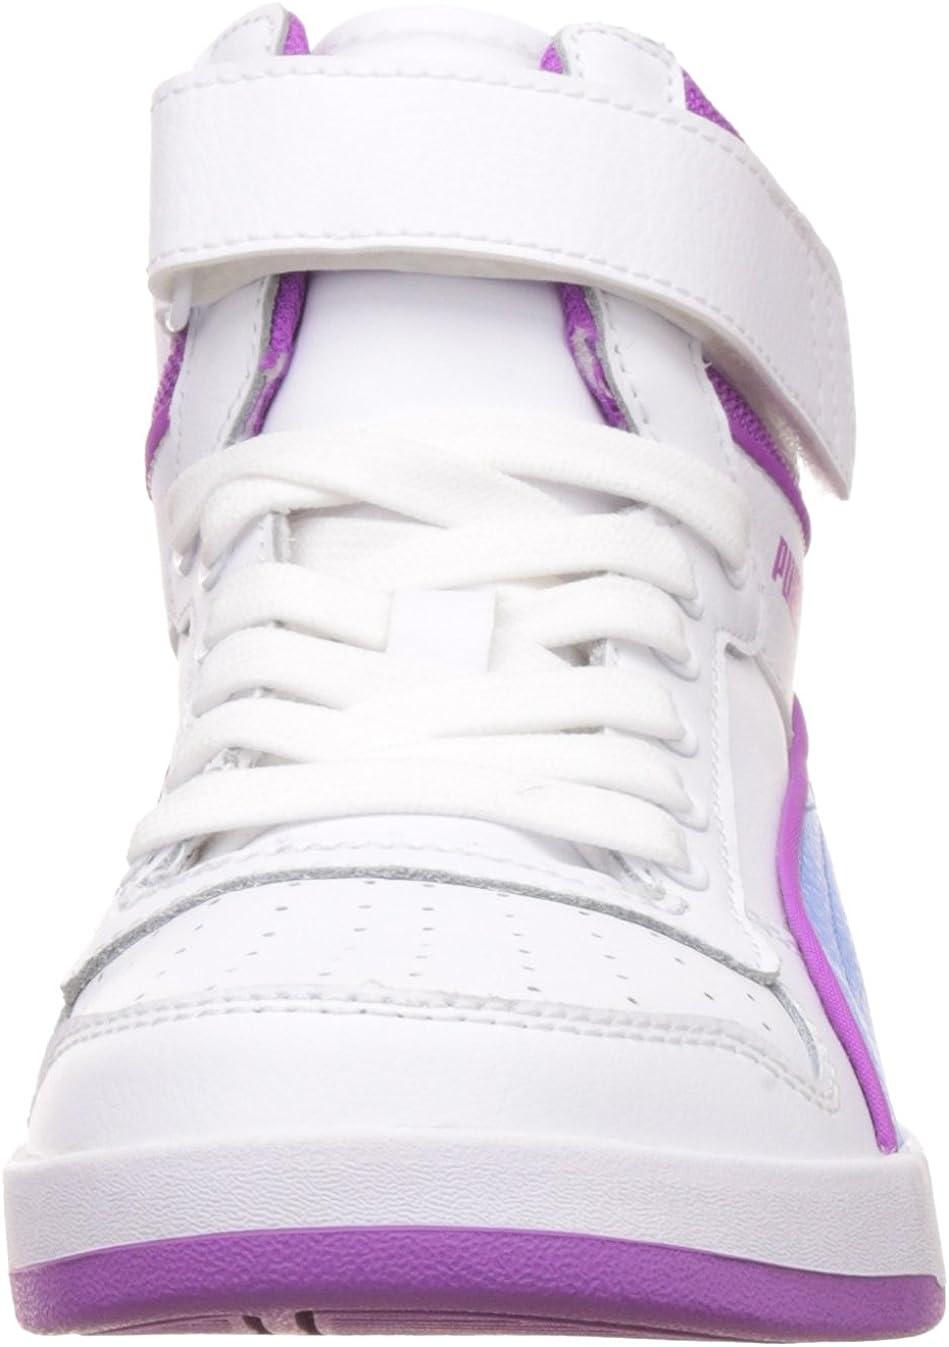 Sneakers Liza mid dazz V PS Nero-Lavanda Bambino